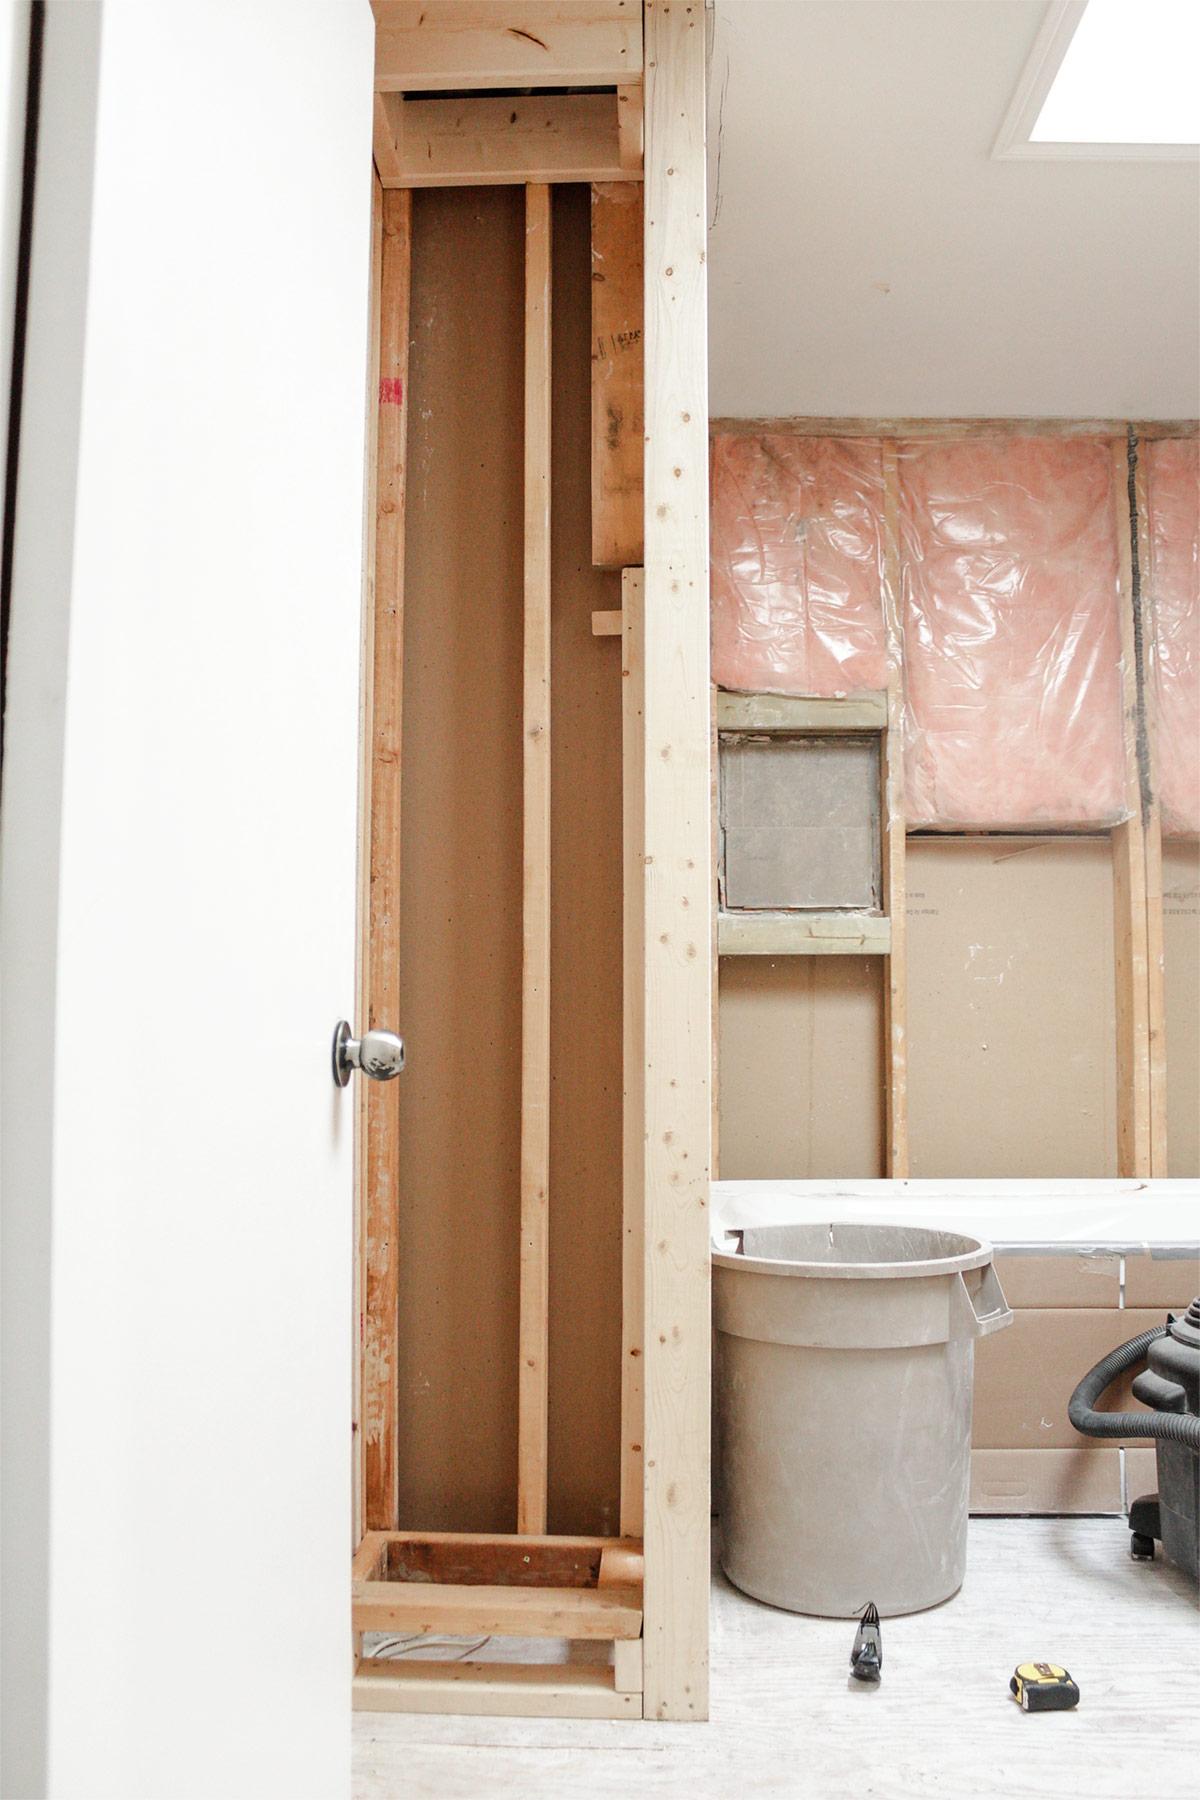 Bathroom built-in shelving plans by Ashley Izsak